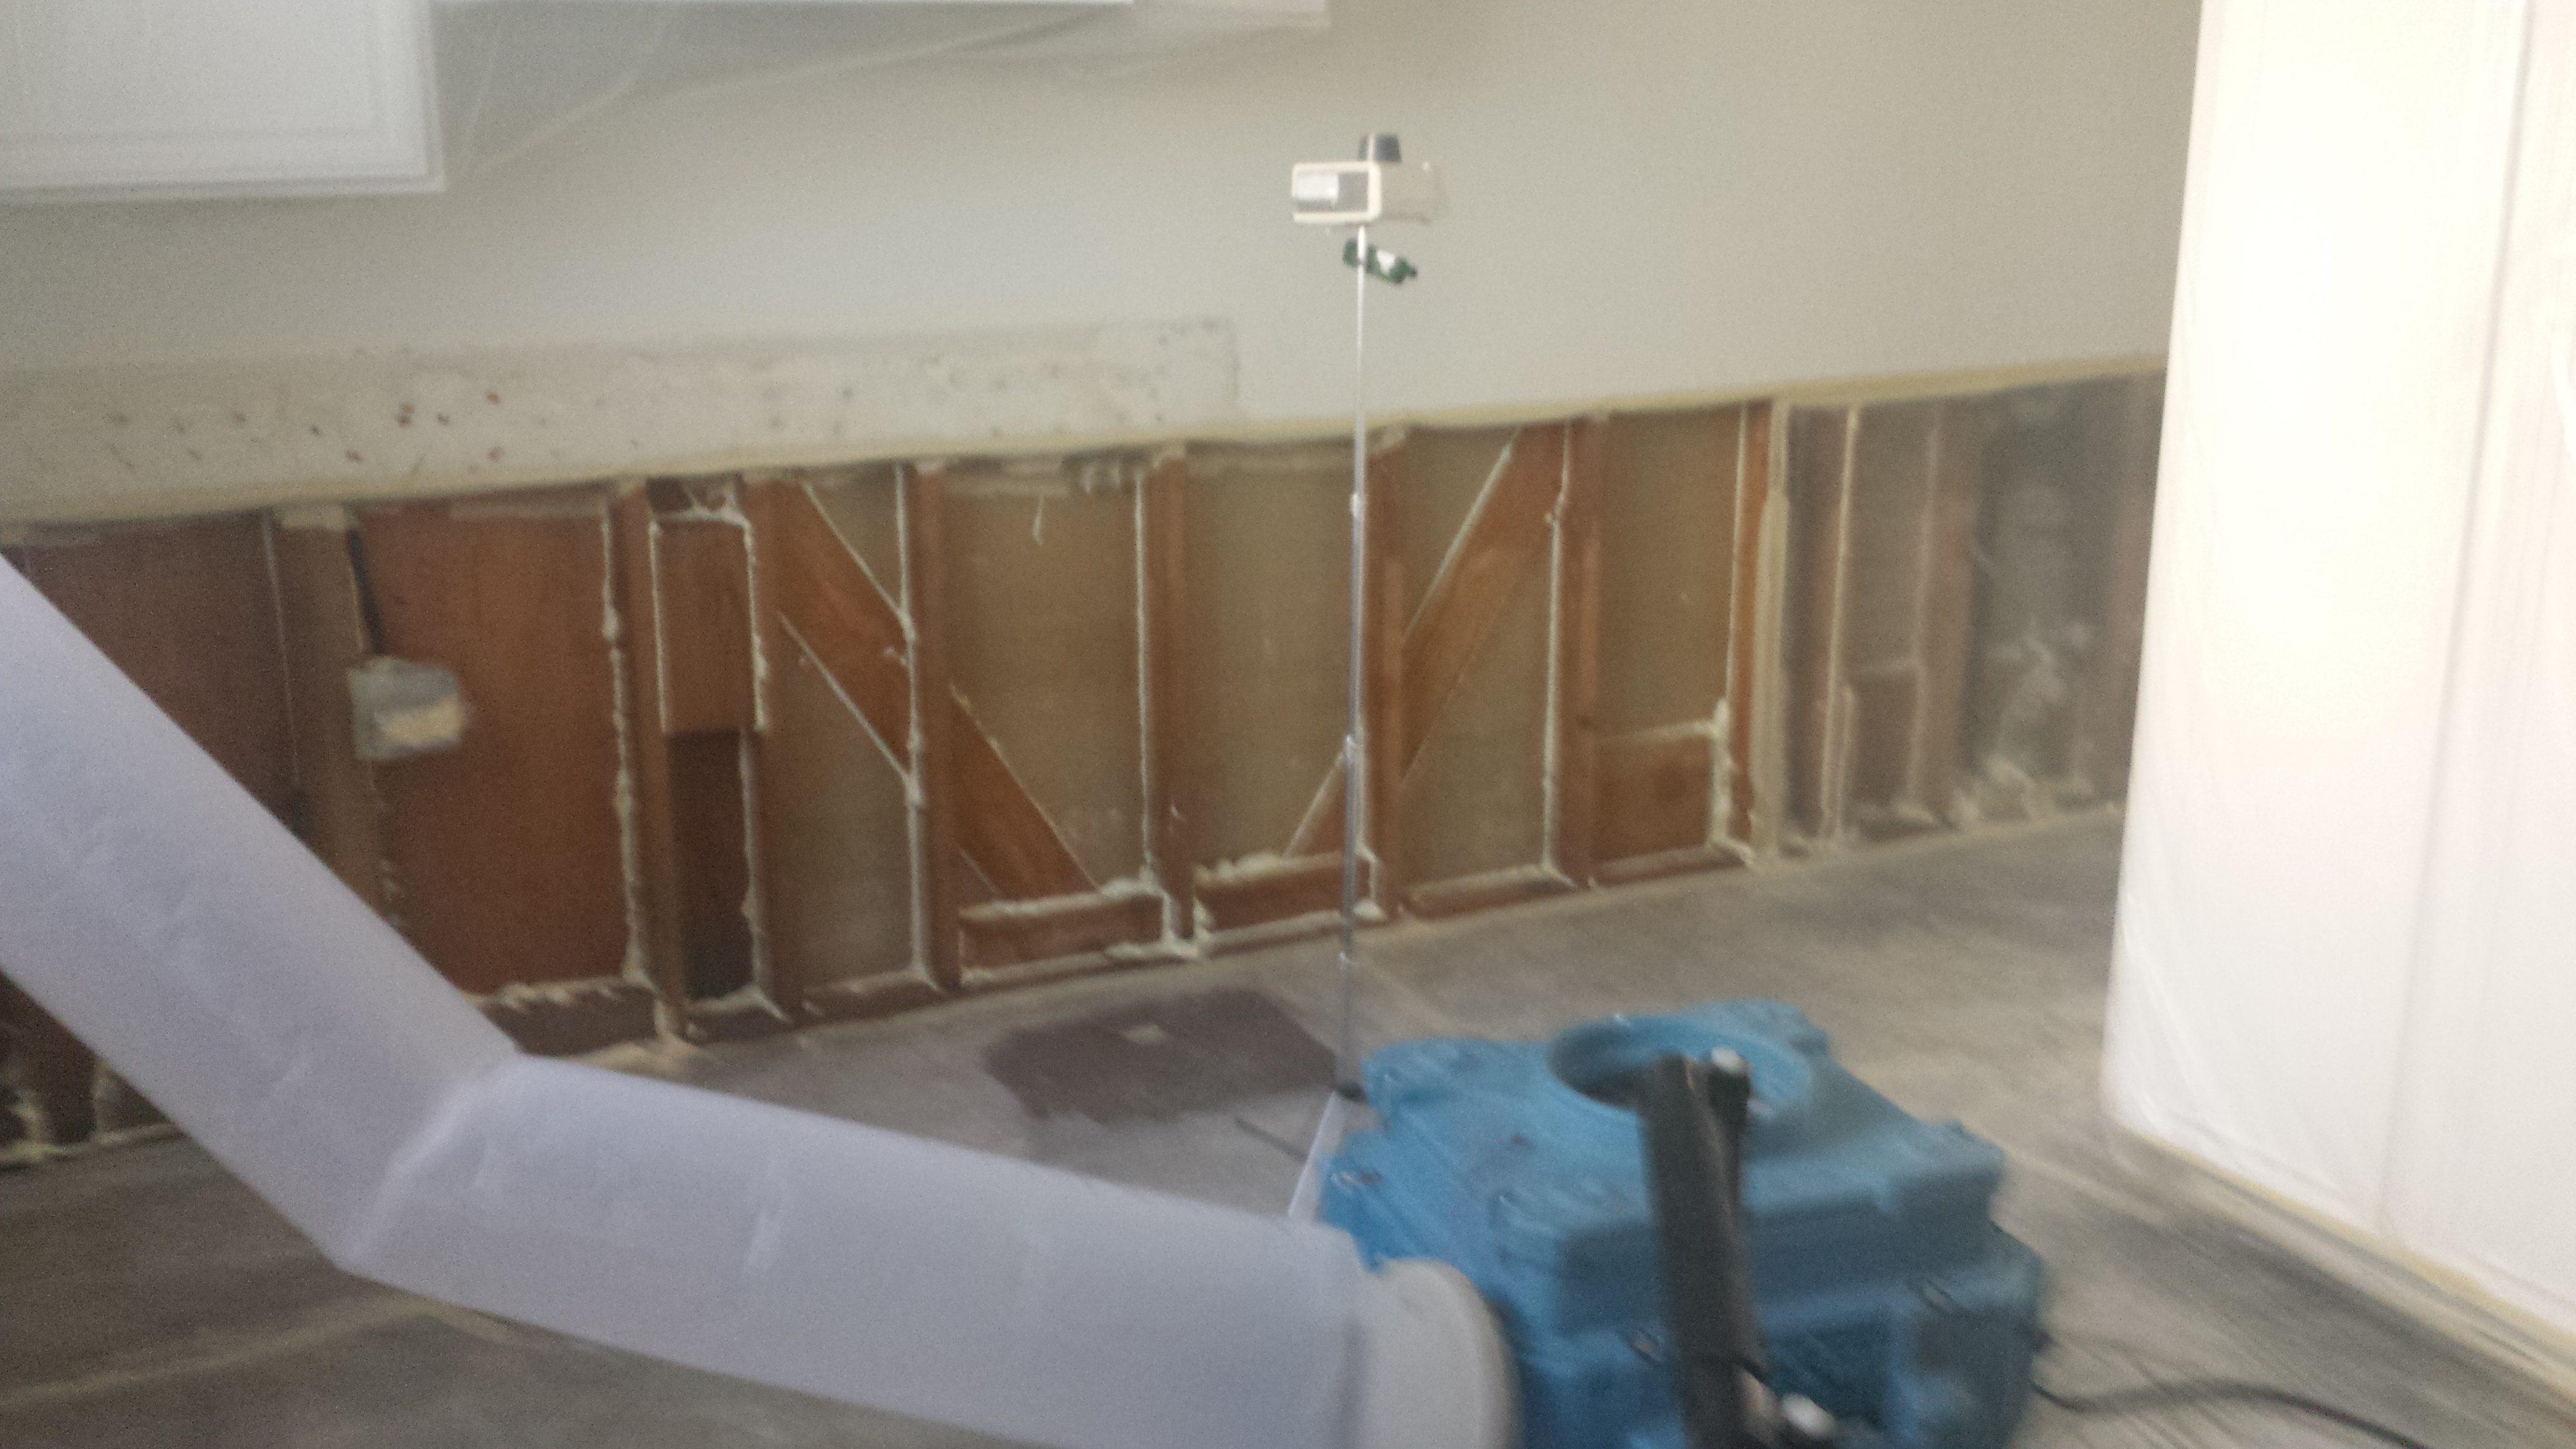 mold removal sealants